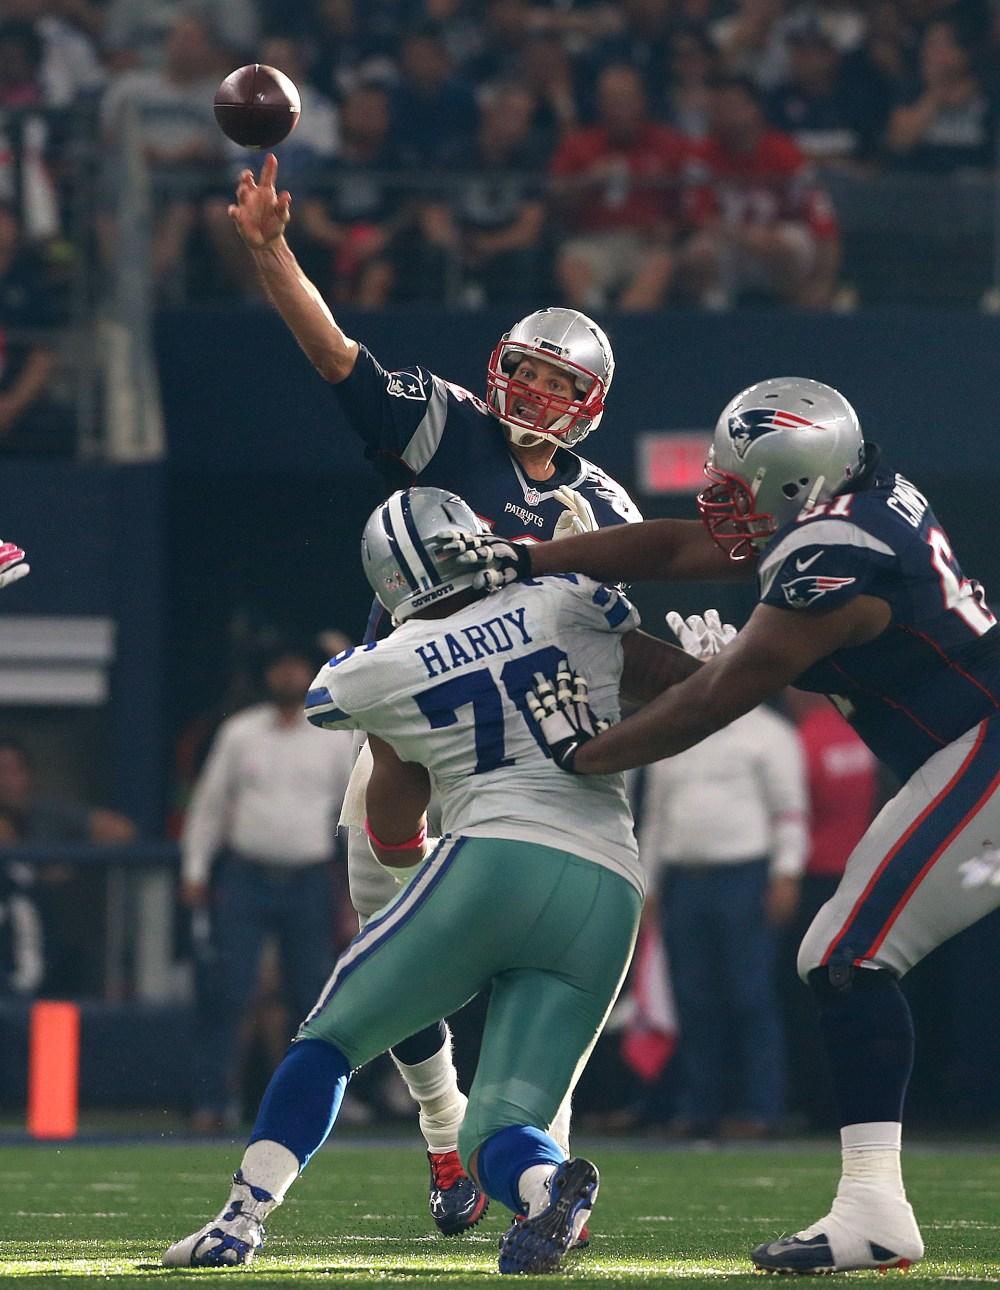 Cowboys Blog - Bright Stars: Cowboys Players of the Week from 30-6 Loss 1